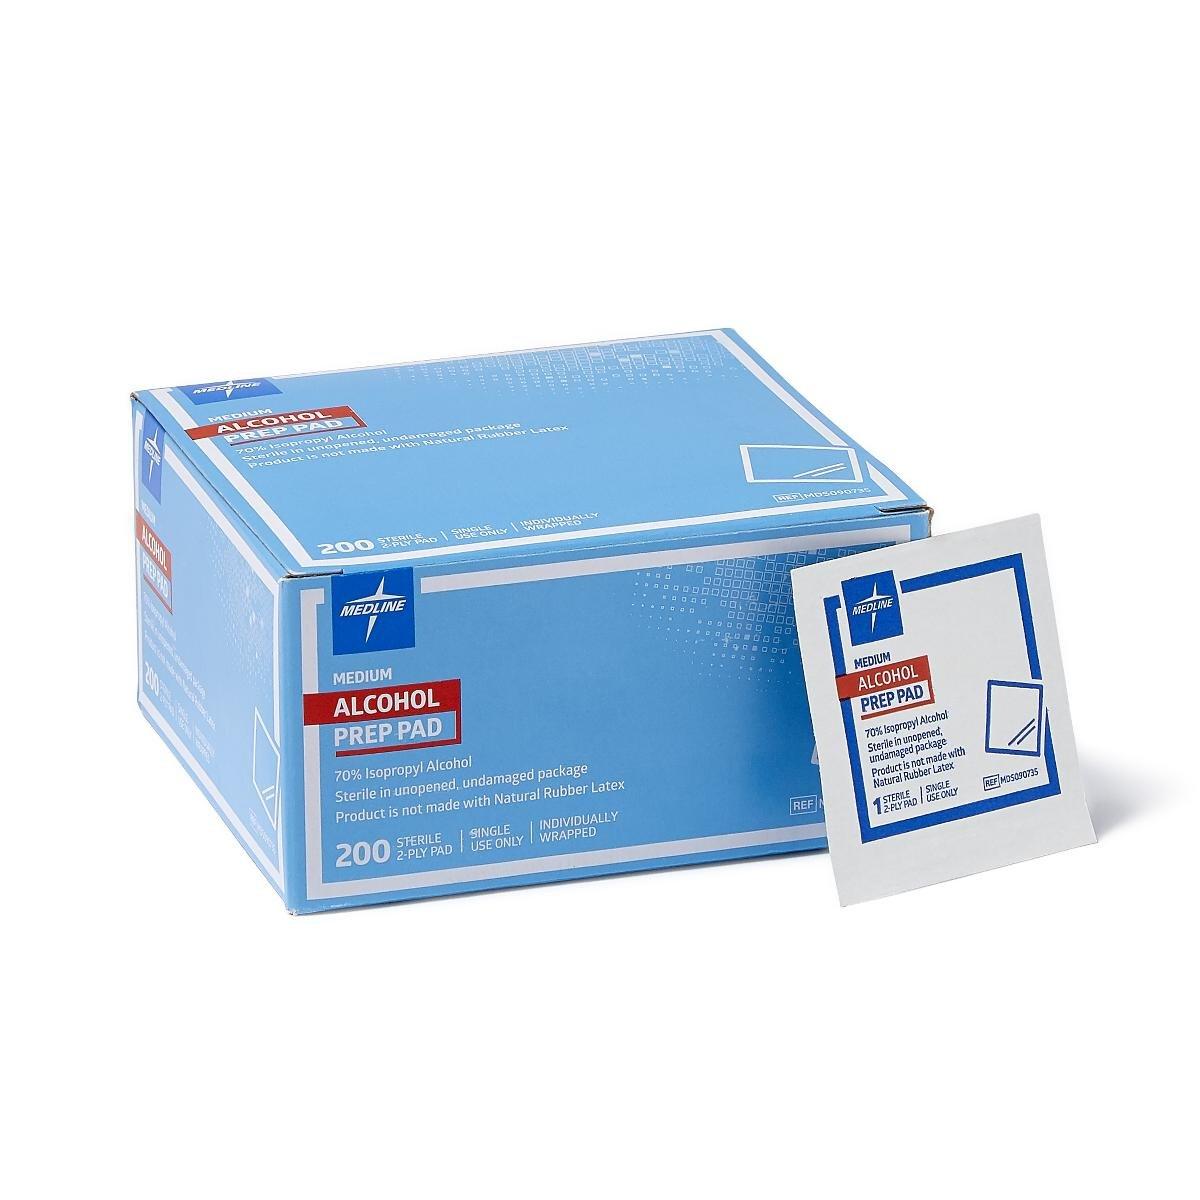 Medline Sterile Medium Prep Pads 70% Isopropyl Alcohol Antiseptic 200 Count $2.58